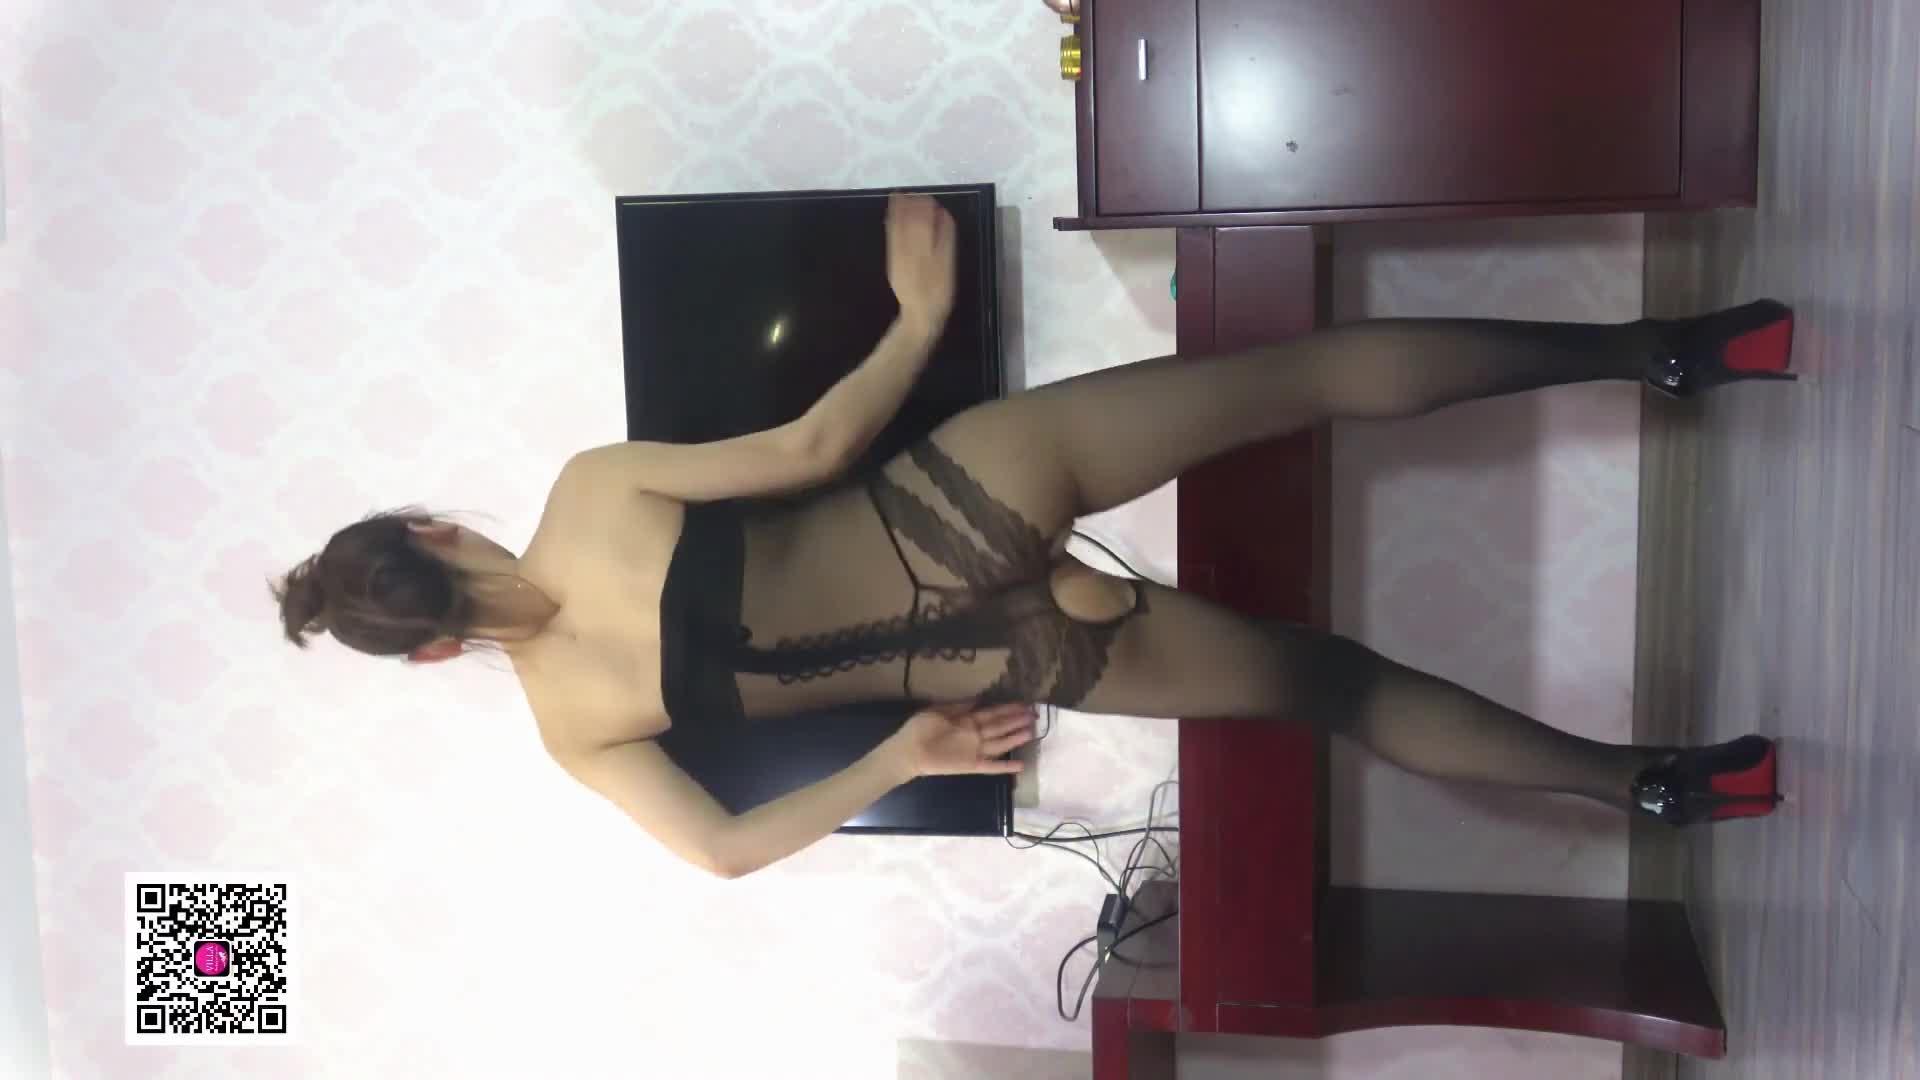 Sexy Dance 烈焰 黑色開襠連身絲襪 動感火辣熱舞賞析